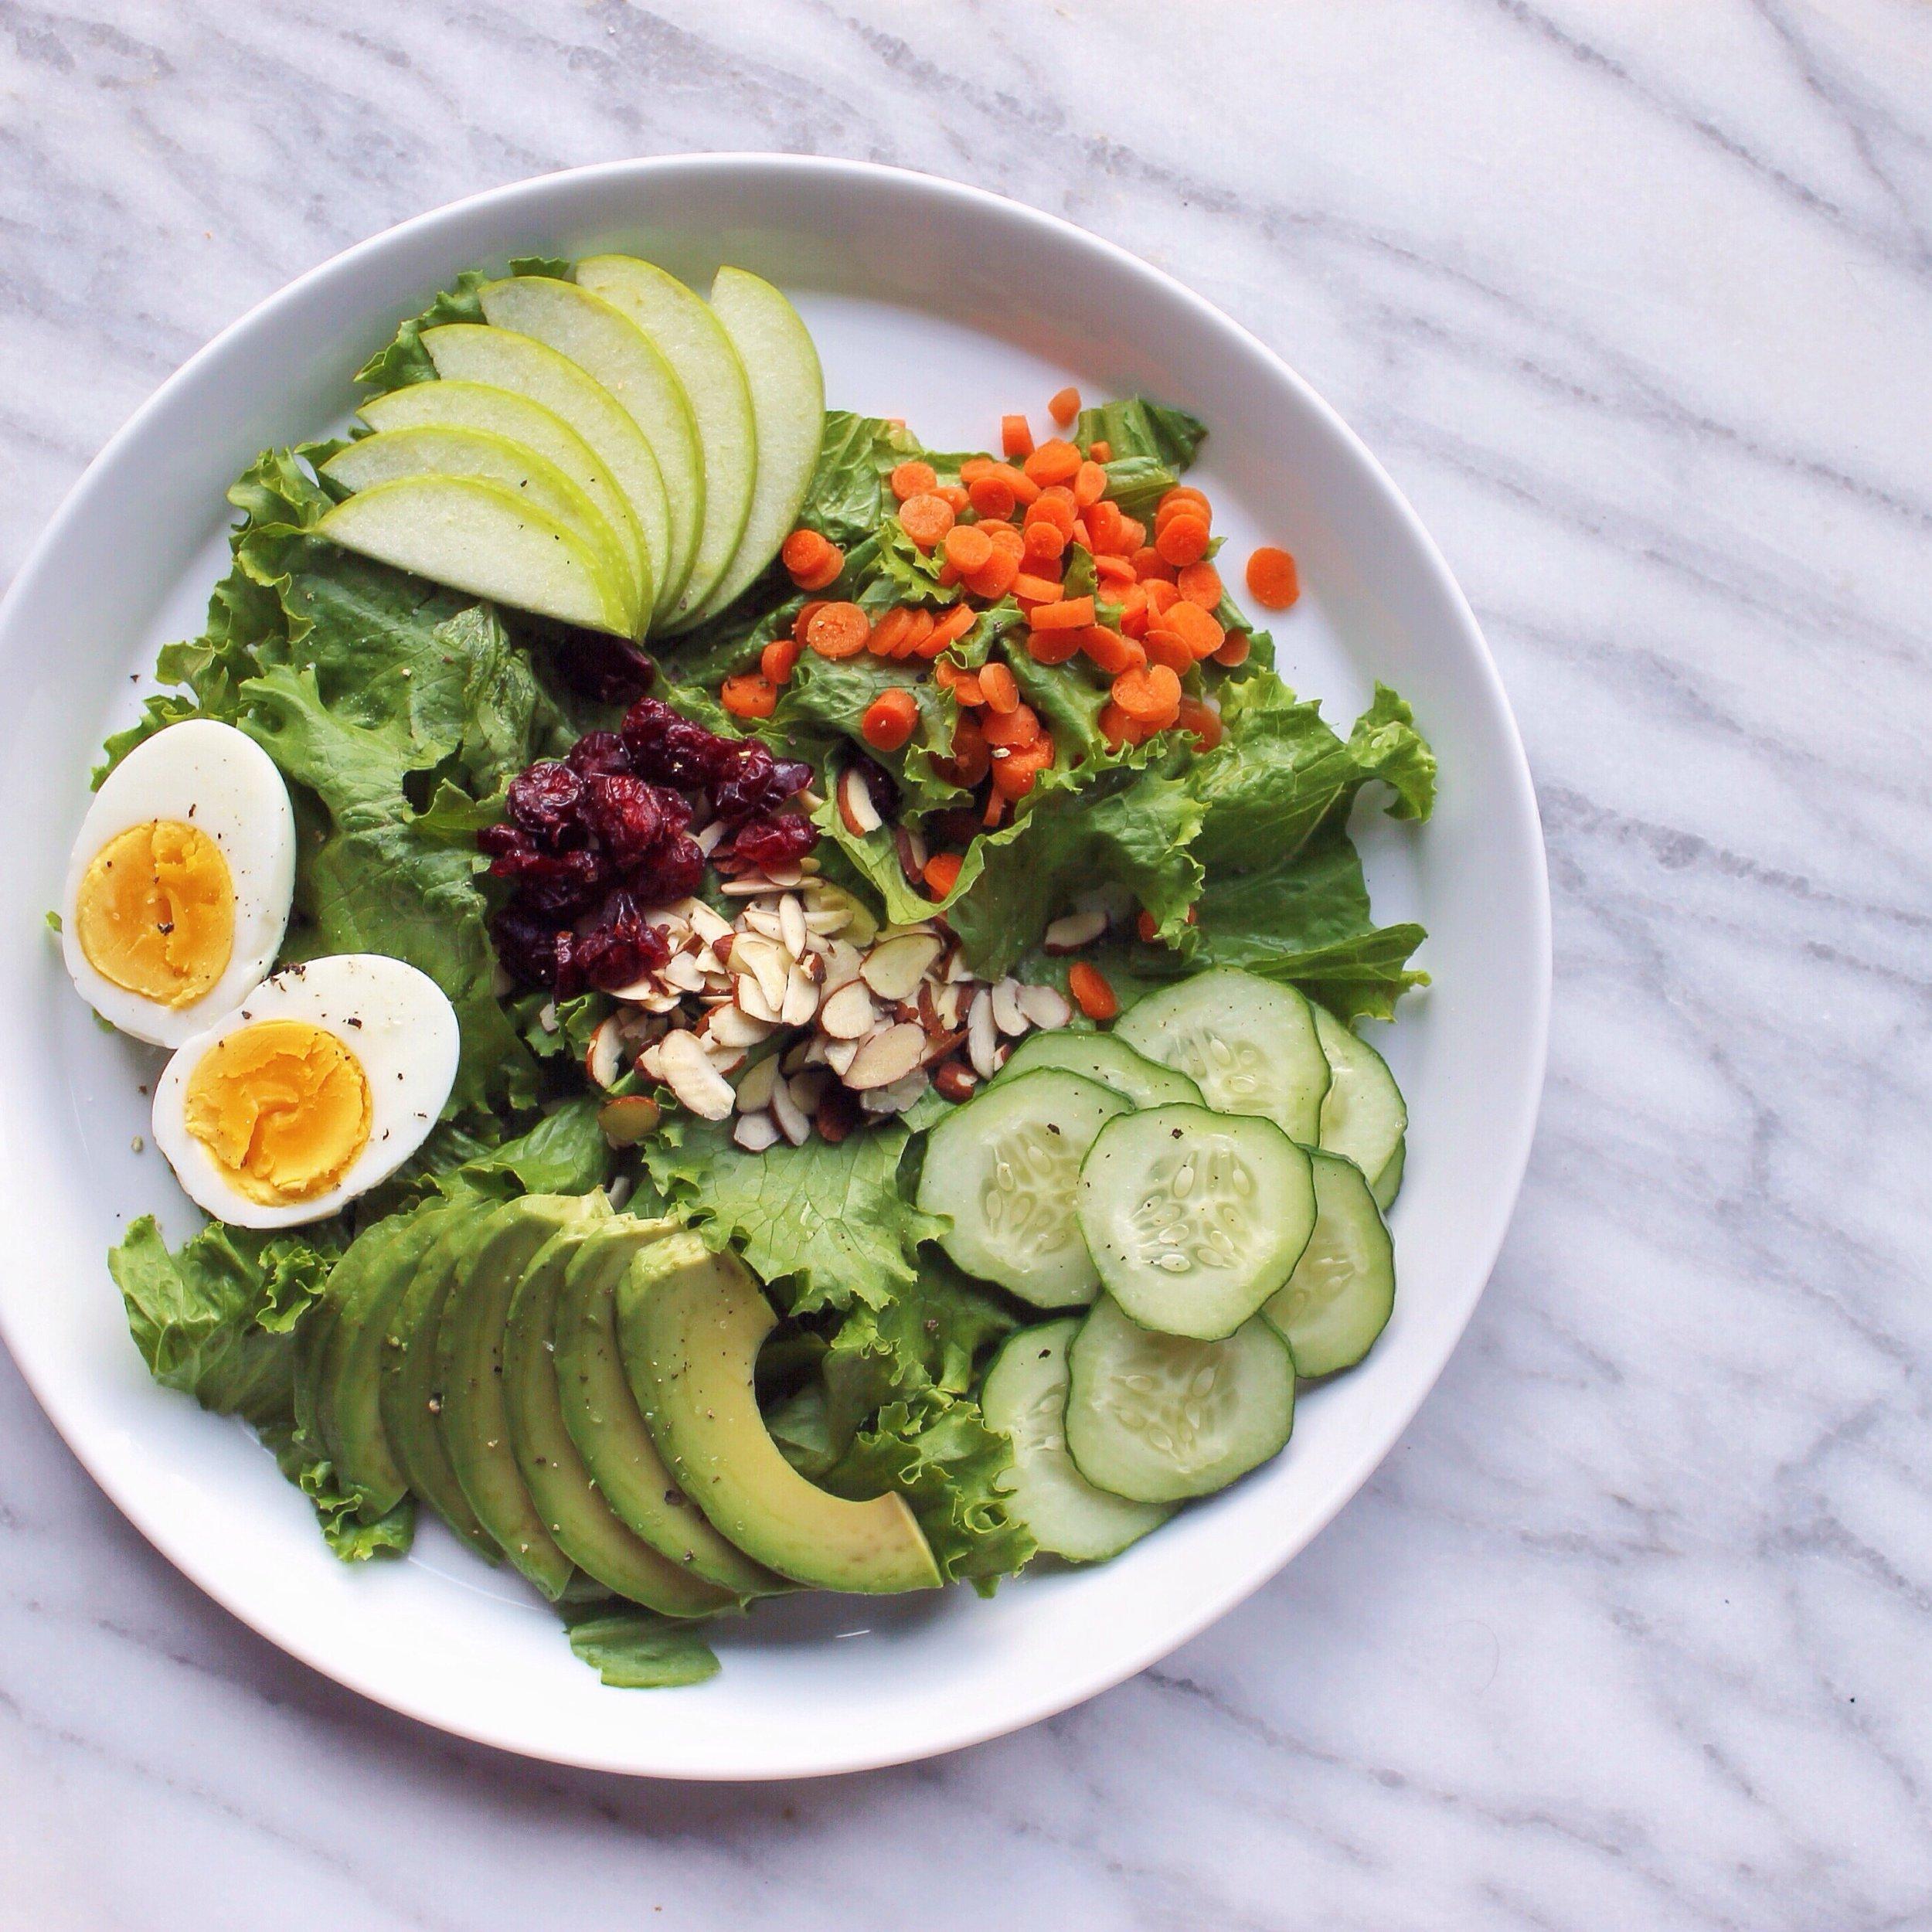 Apple_avocado_salad.JPG